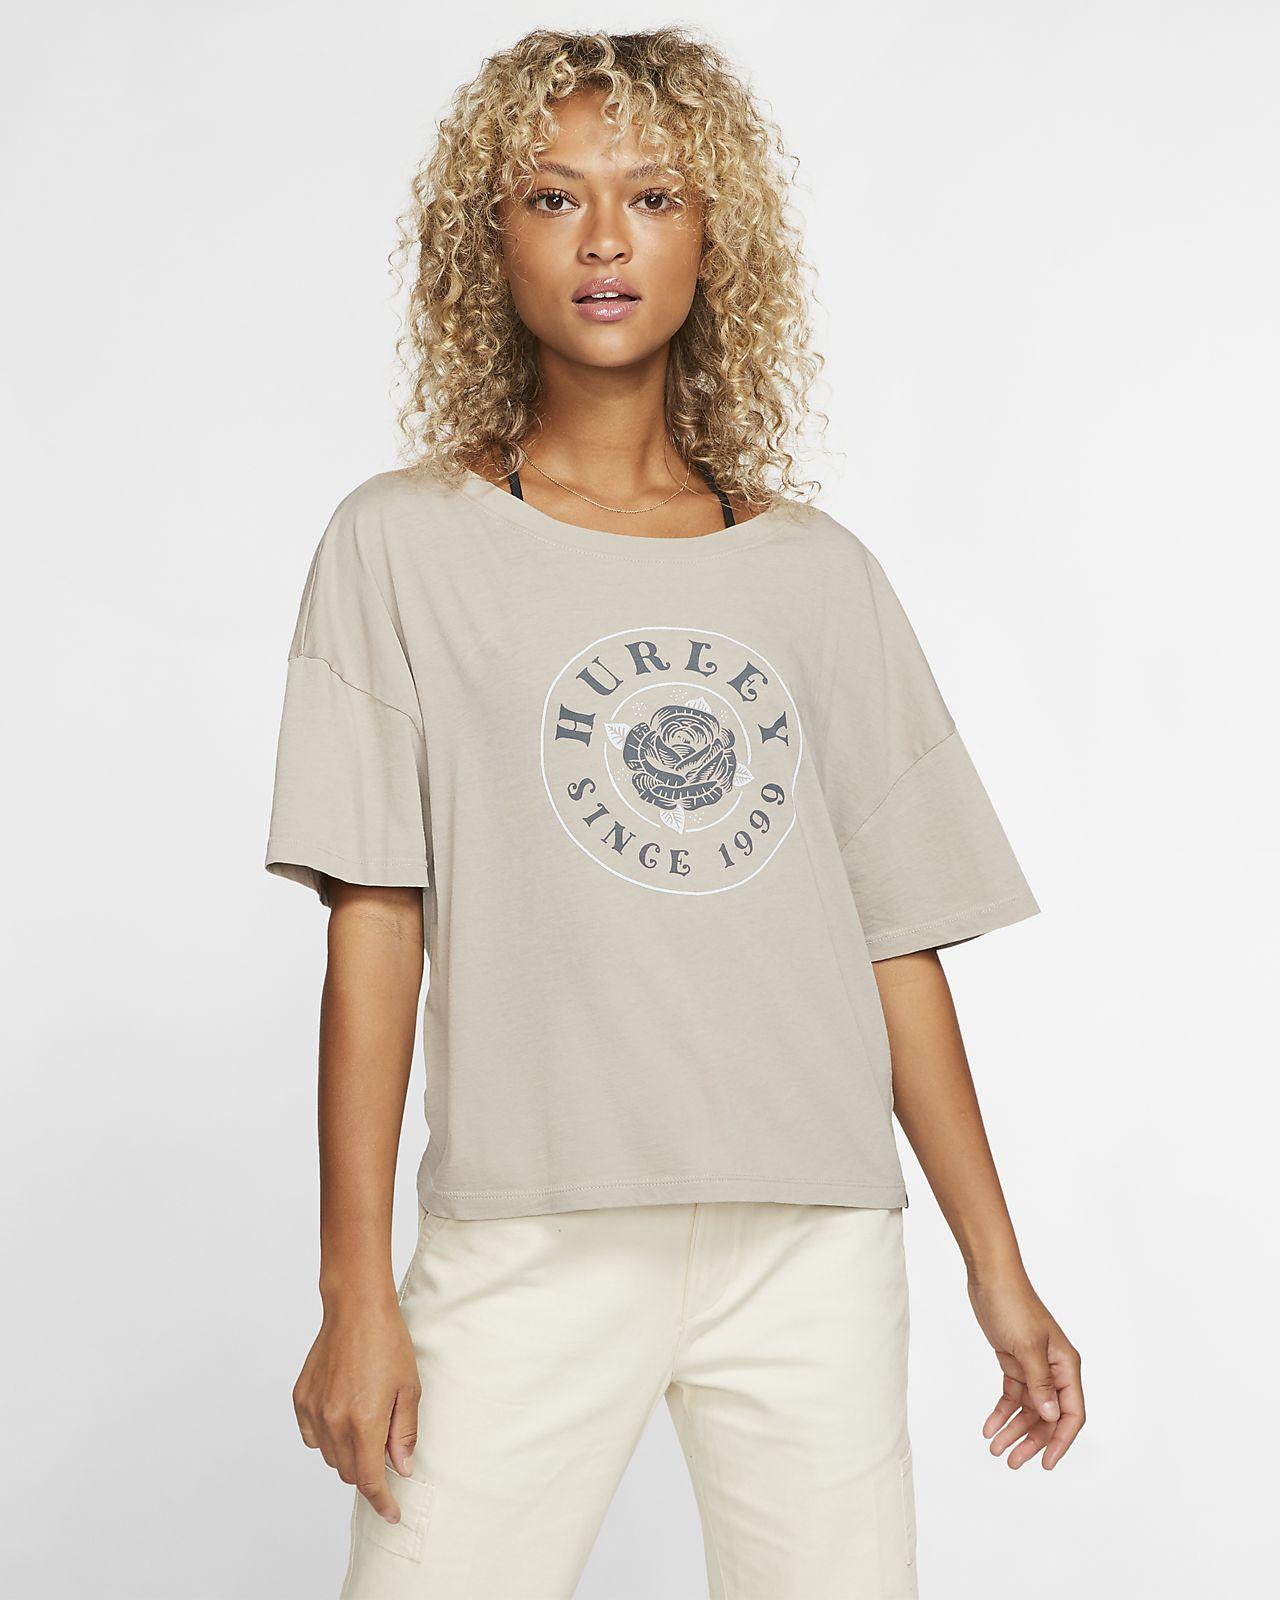 nike t shirt damen beige